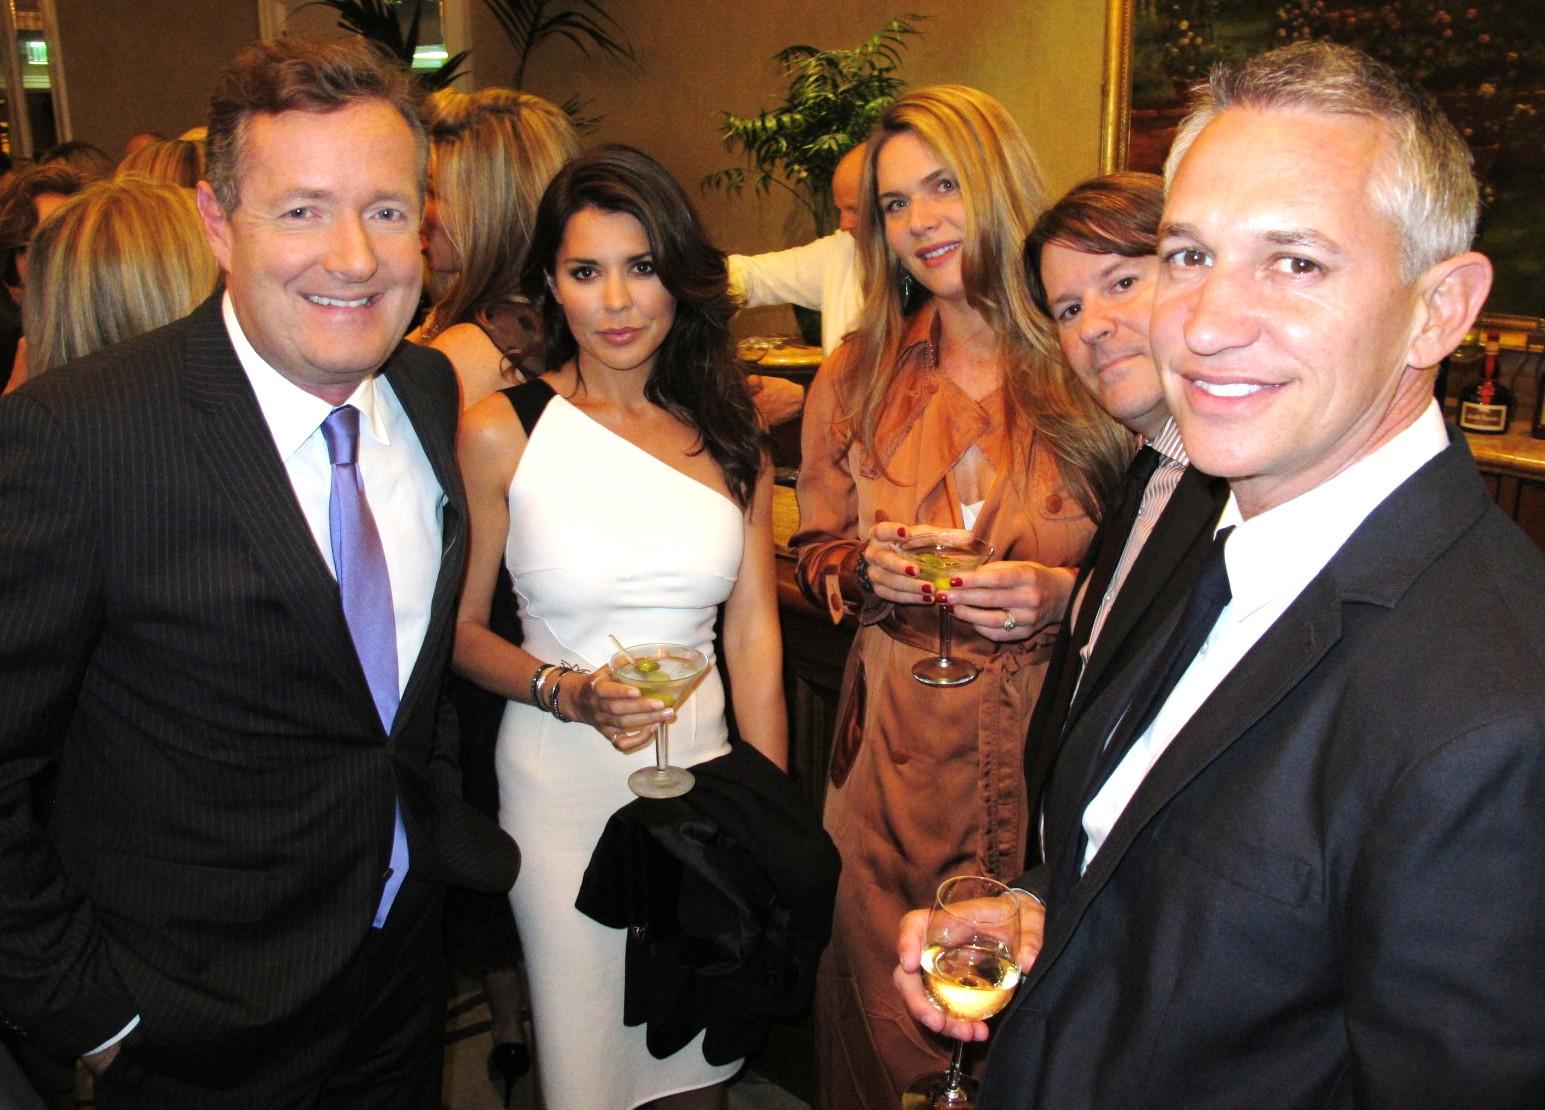 Piers Morgan, Brady Center to Prevent Gun Violence